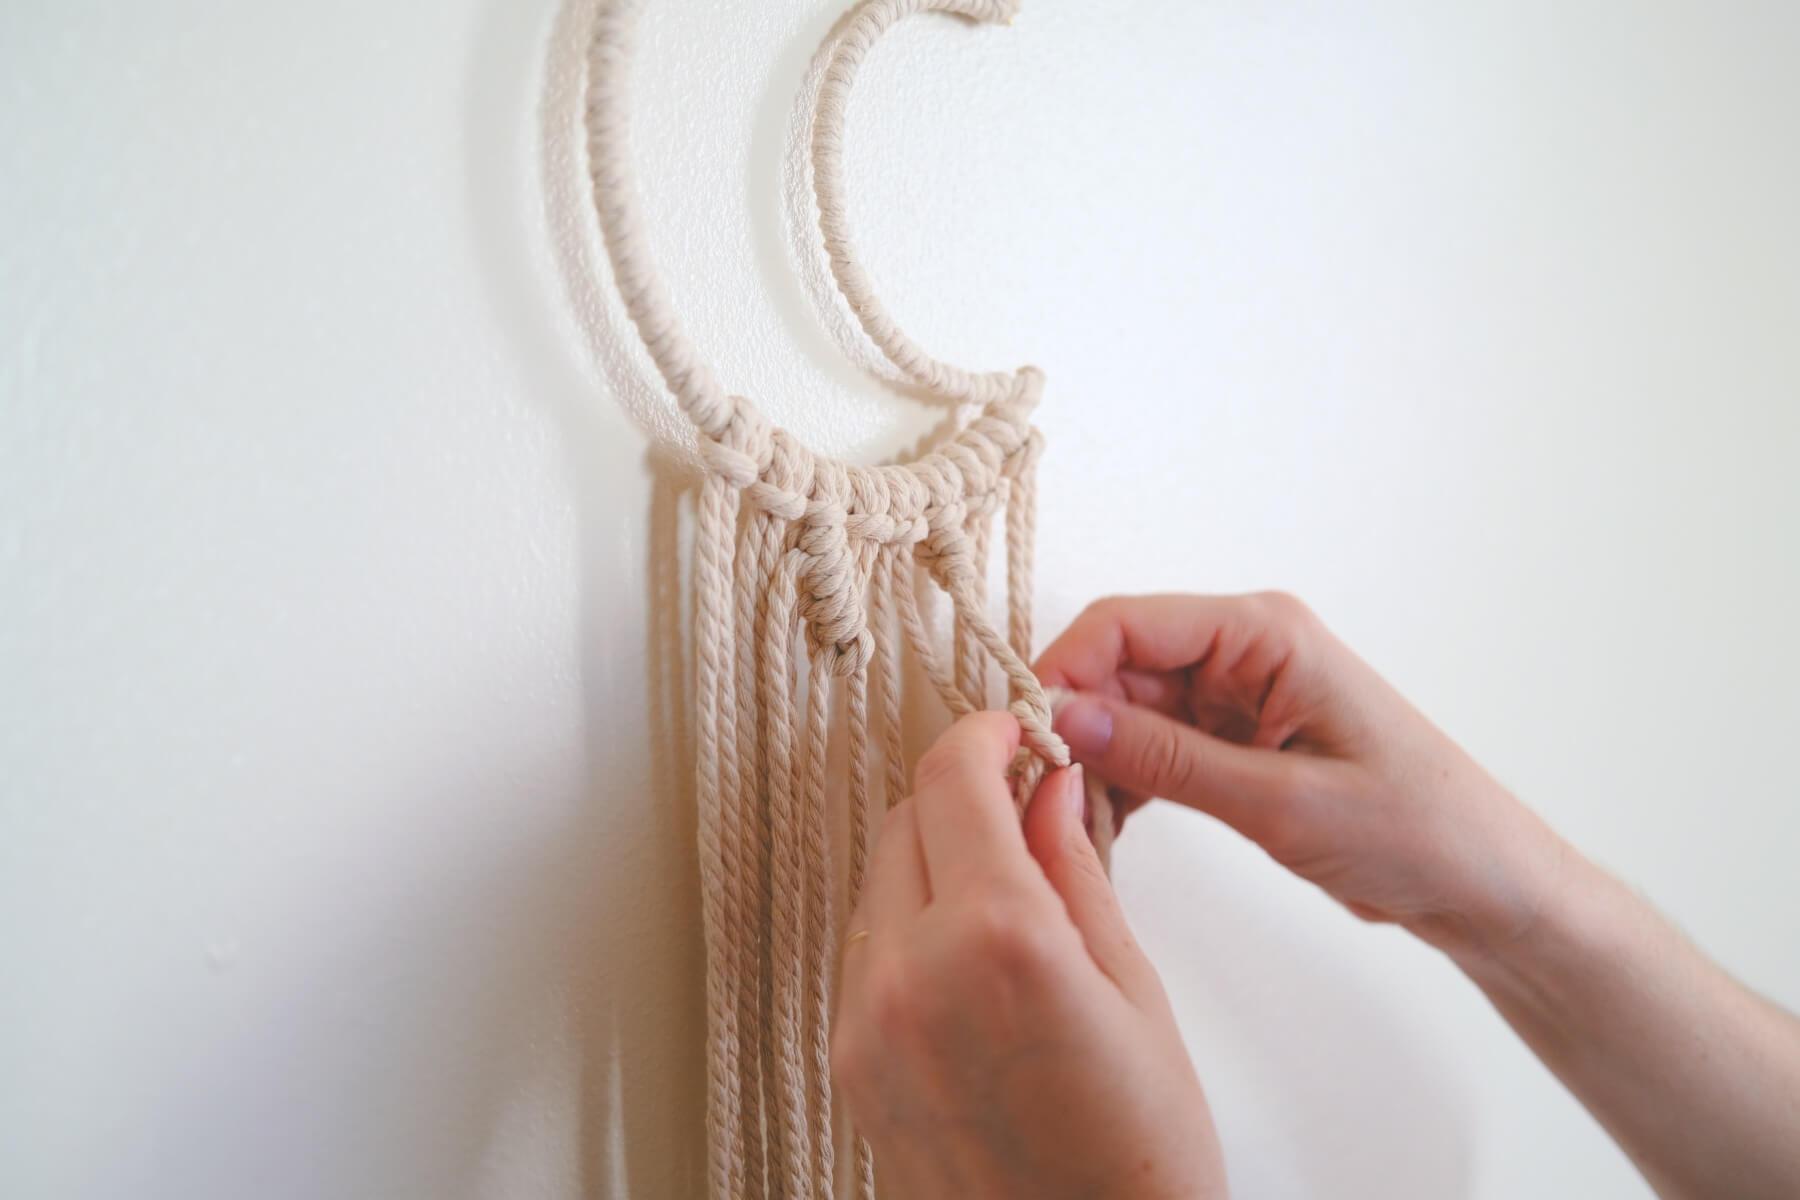 moon macrame wall hanging knot tutorial